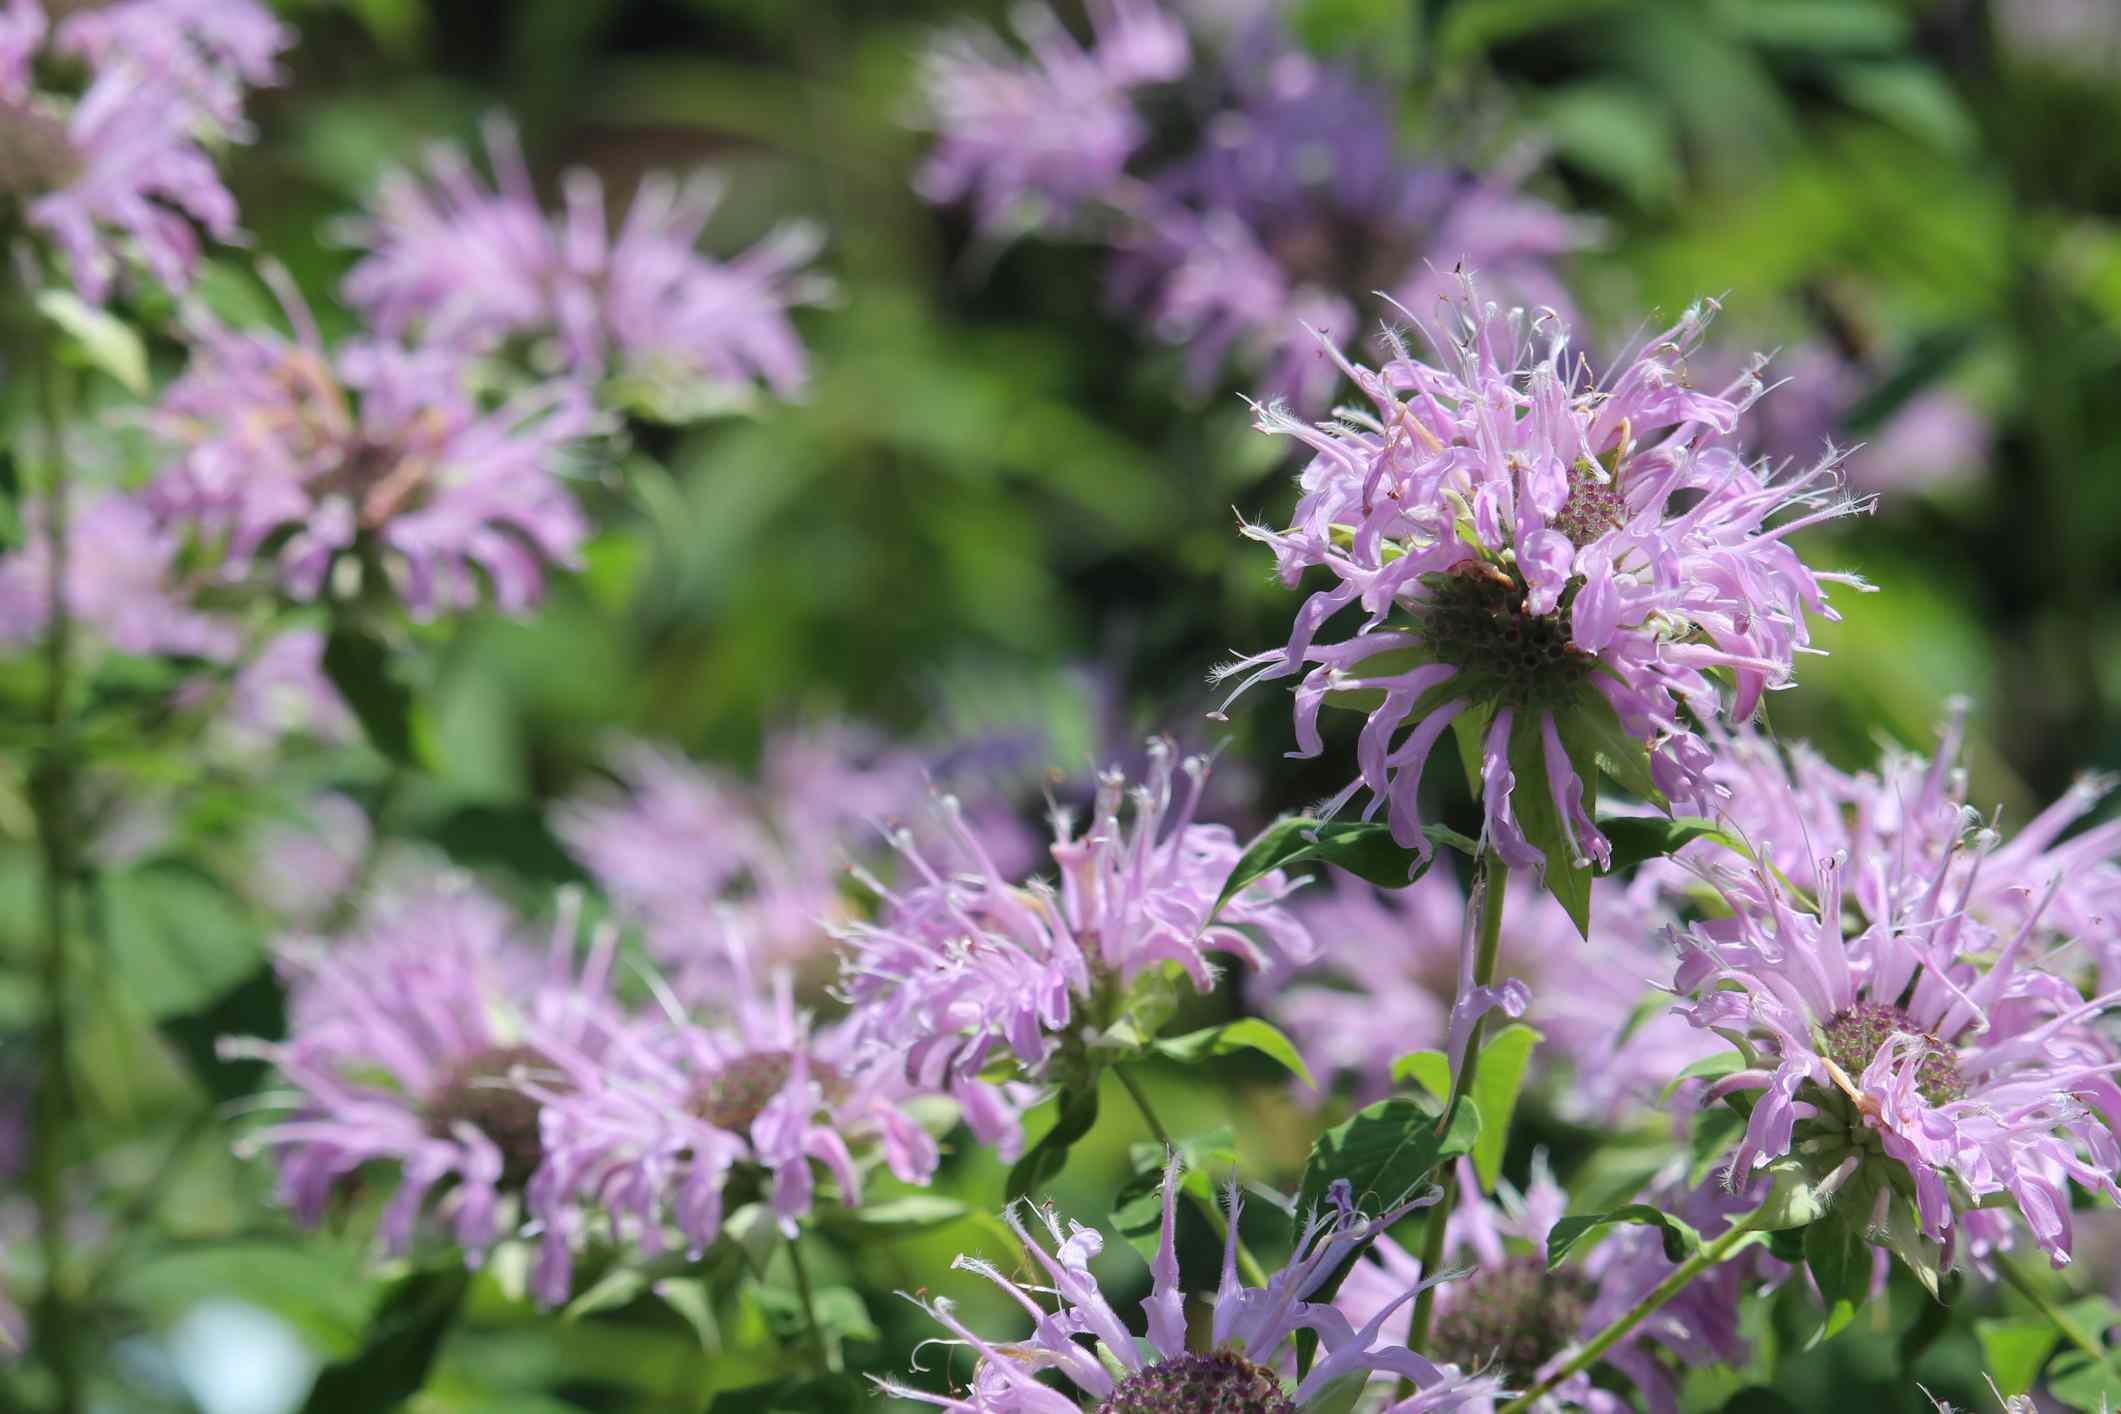 Purple bee balm blossoms